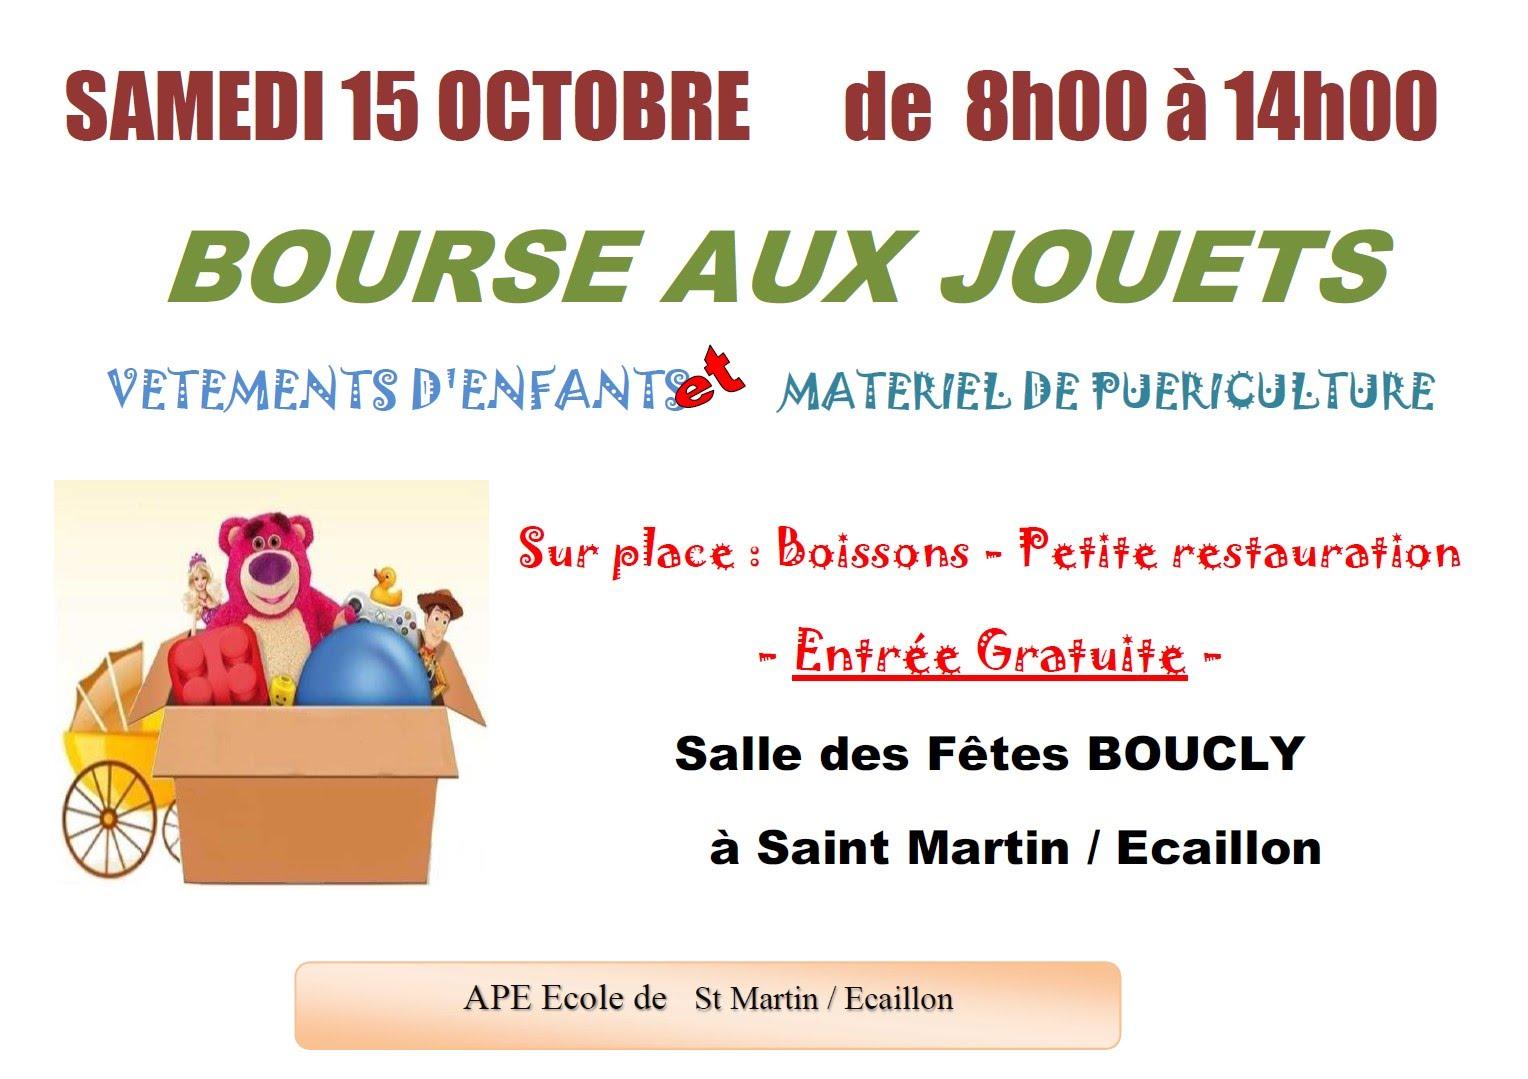 http://www.saintmartinsurecaillon.com/avis-a-la-population/15octobrebourseauxjouetsdelape